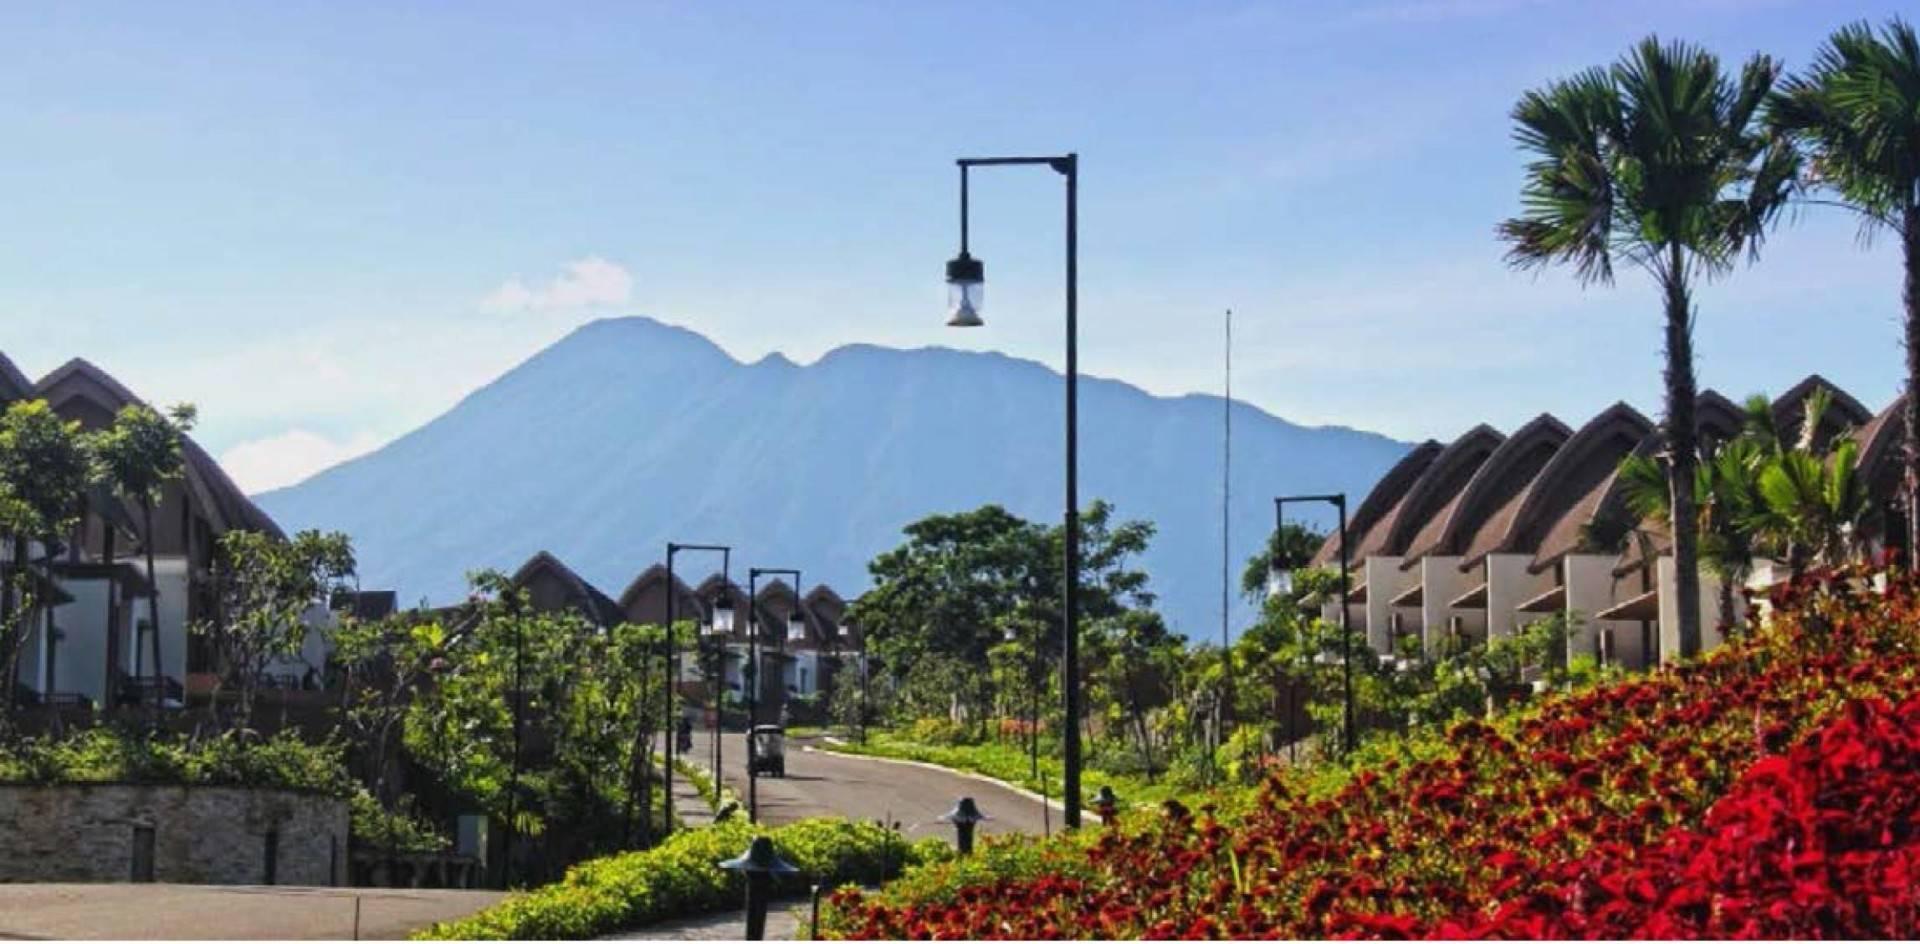 Tau Architect Vimala Hills Residential & Hotel At Ciawi  Bogor, West Java, Indonesia Bogor, West Java, Indonesia Residentials-With-Mount-Pangrango-View Tradisional  3533